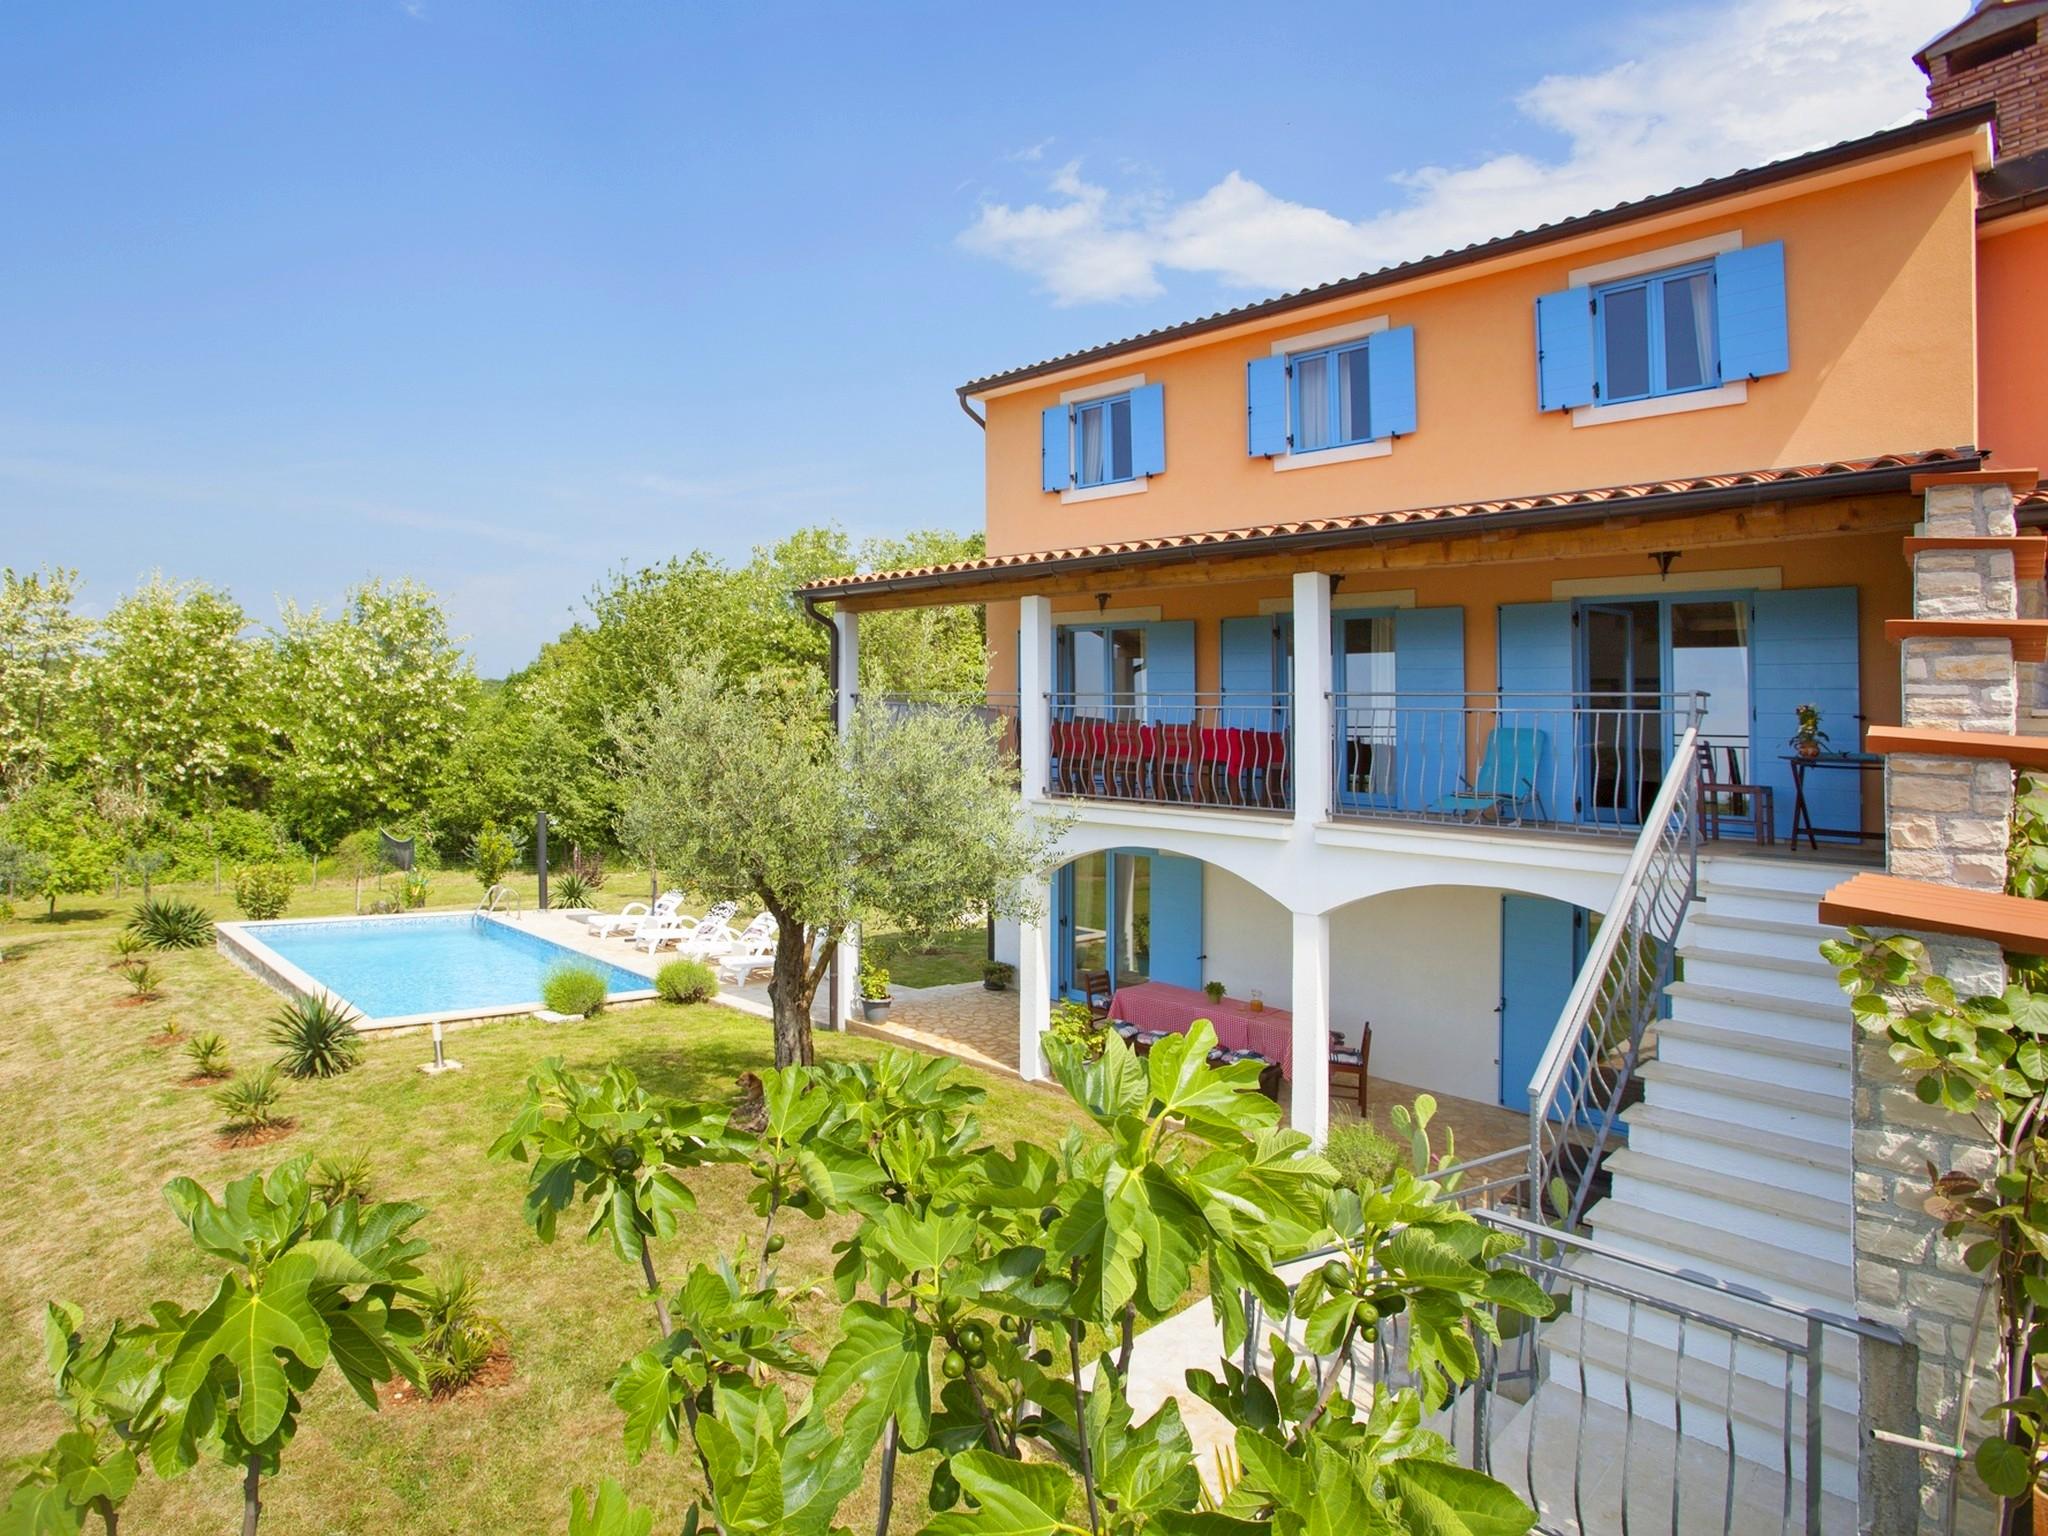 Ferienhaus Bruno, Kua za odmor s bazenom (2204668), Mugeba, , Istrien, Kroatien, Bild 1